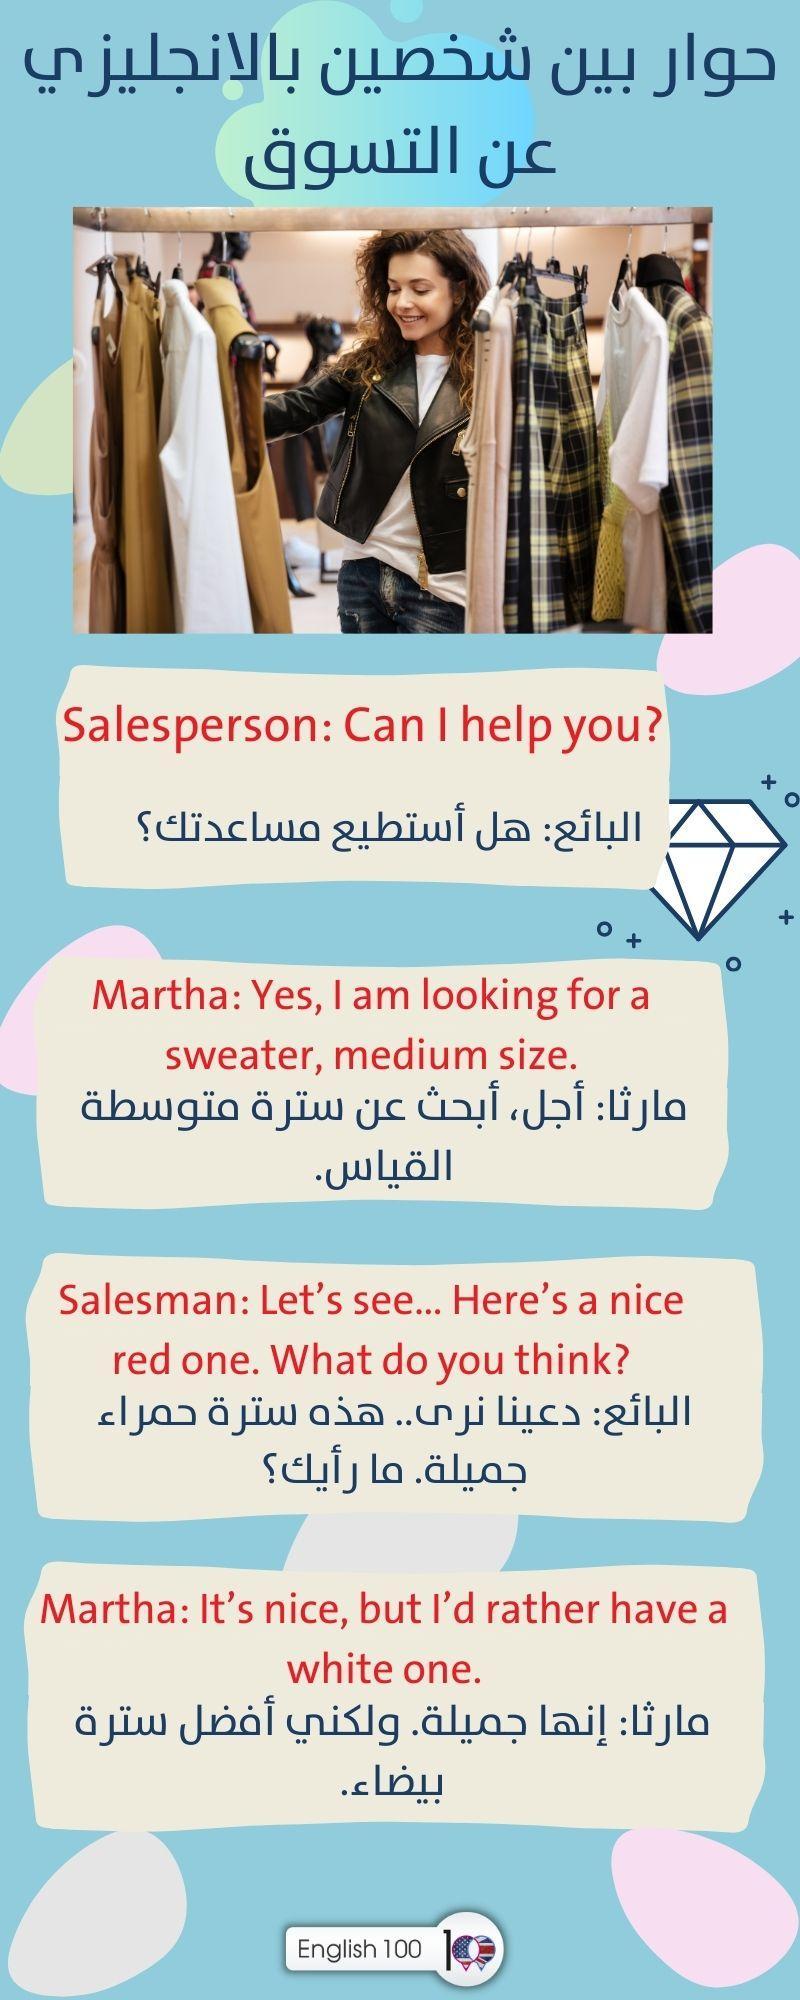 حوار بين شخصين بالانجليزي عن التسوق A dialogue between two people in English about shopping